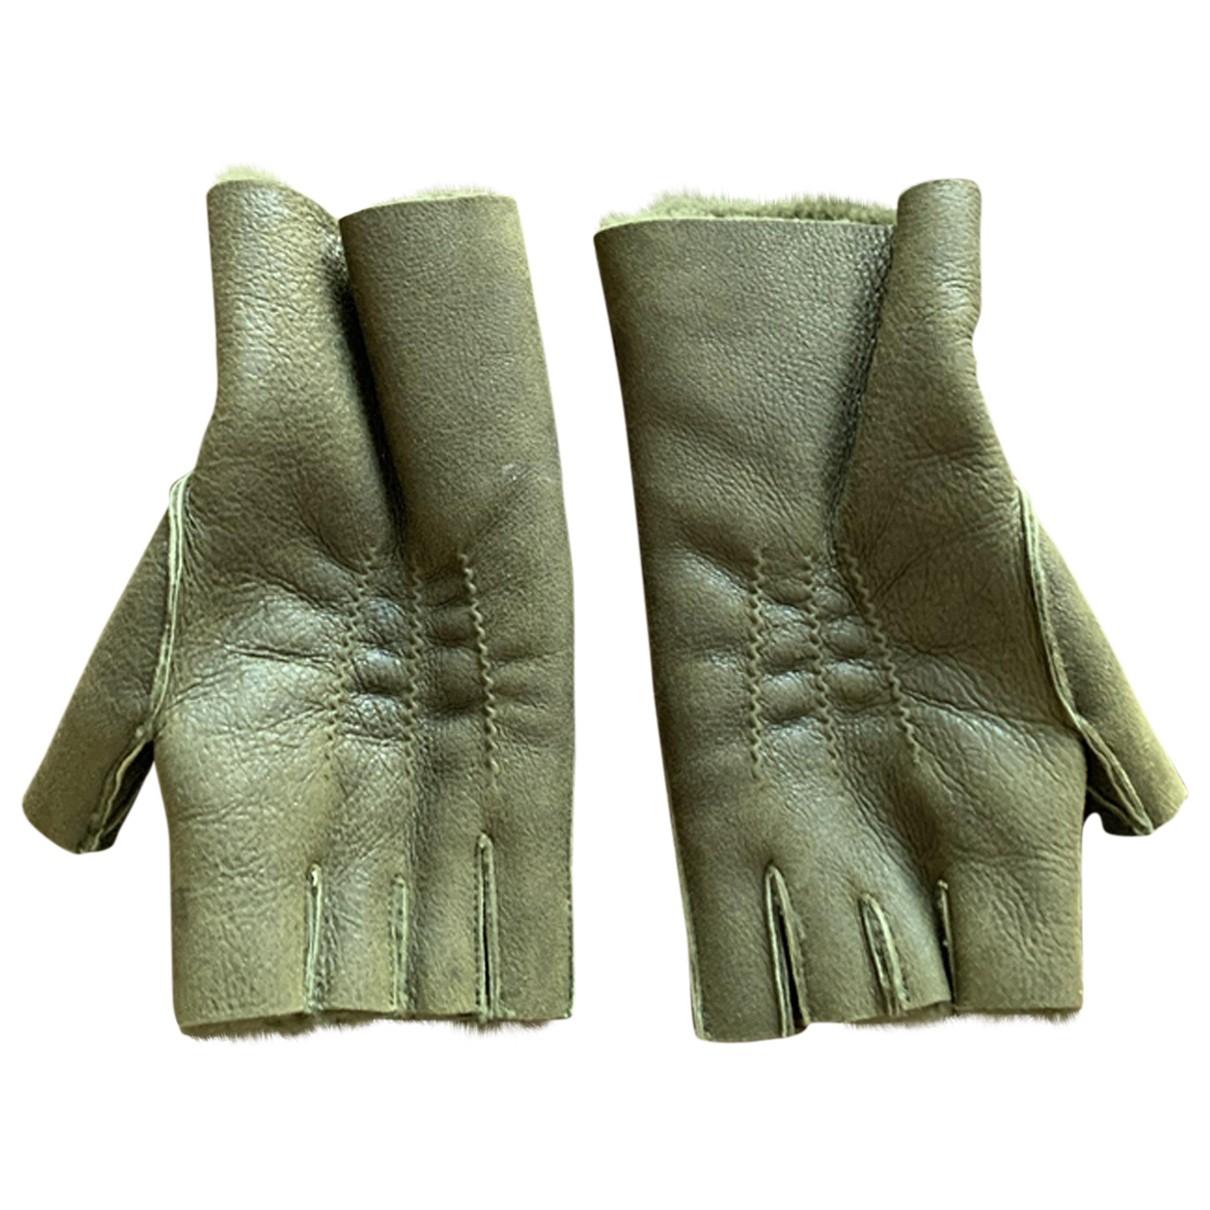 Balmain \N Khaki Shearling Gloves for Men M International